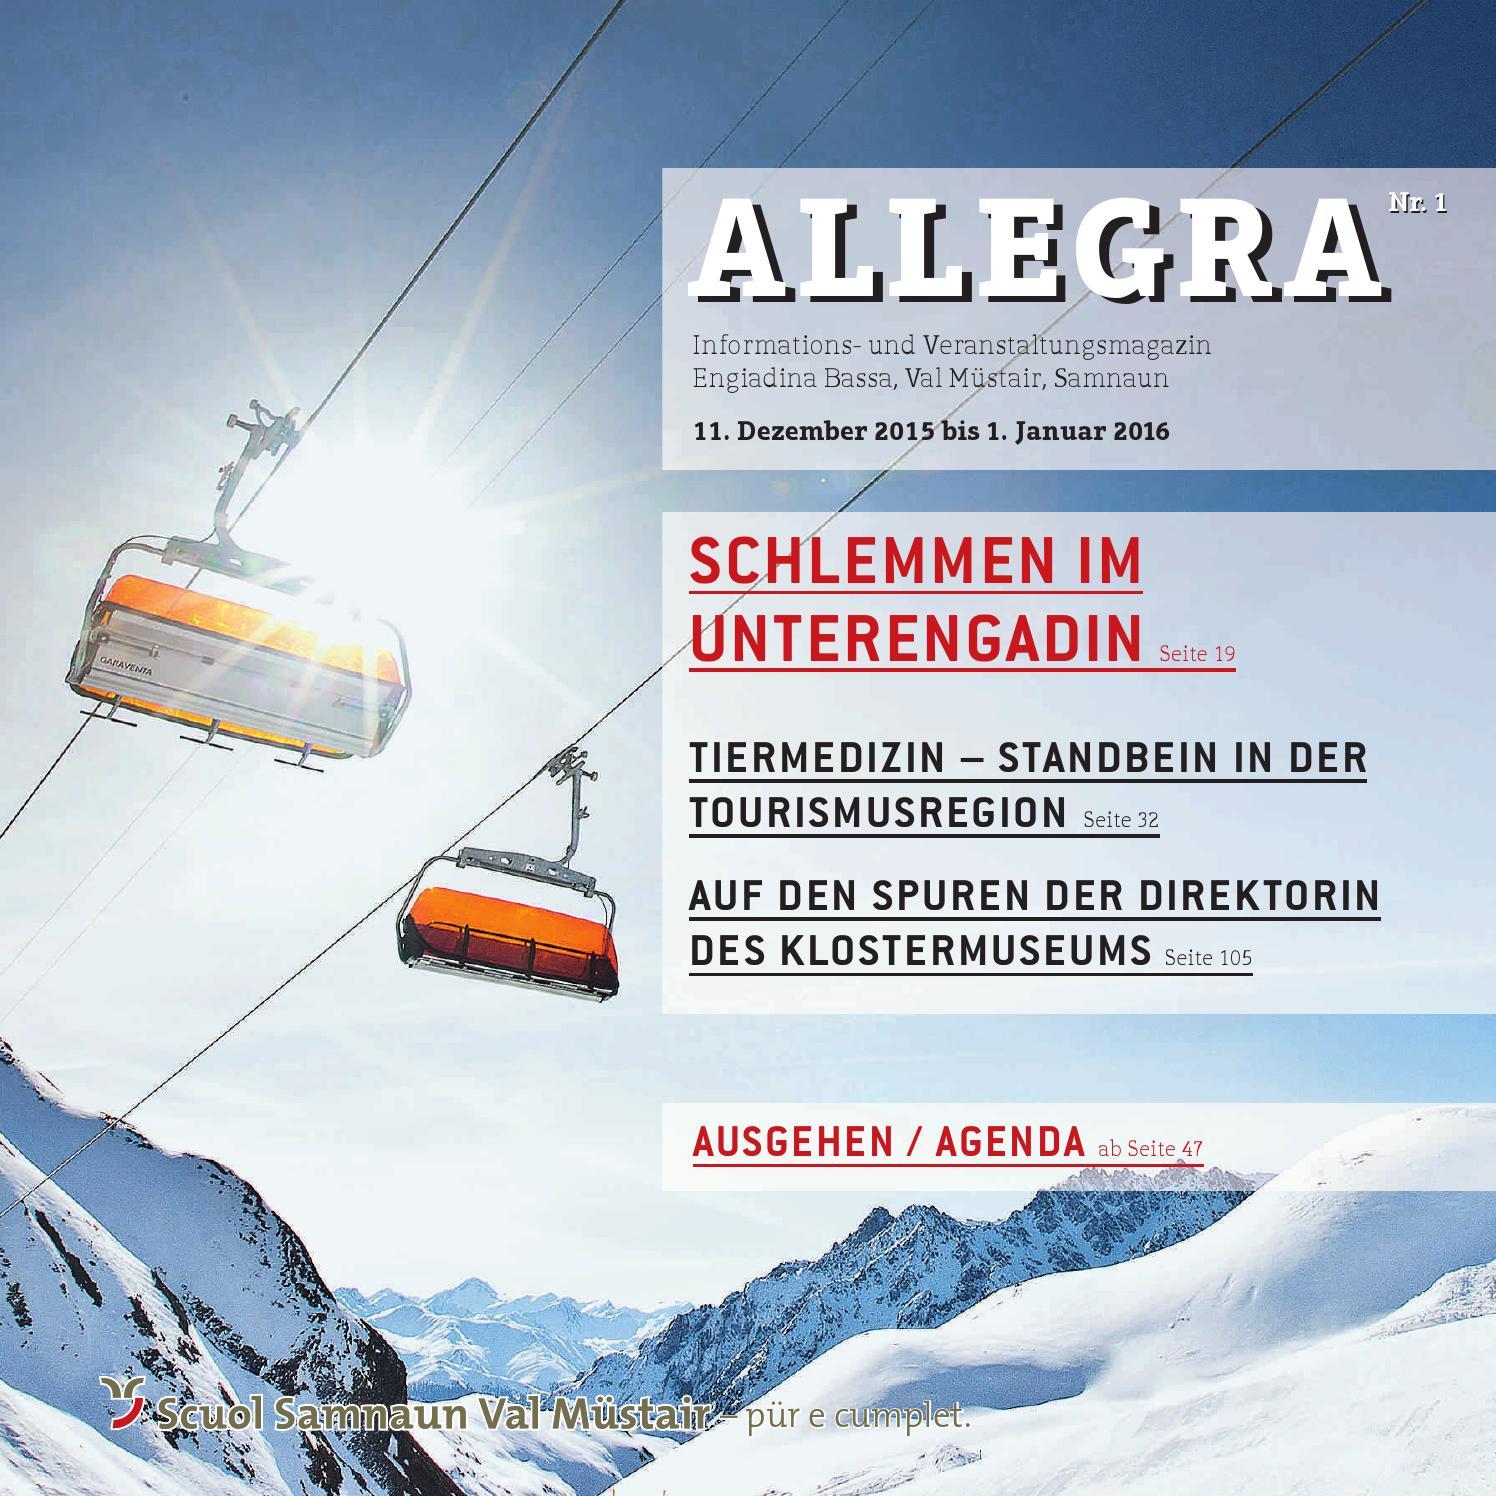 Allegra by Tourismus Engadin Scuol Samnaun Val Müstair AG - issuu